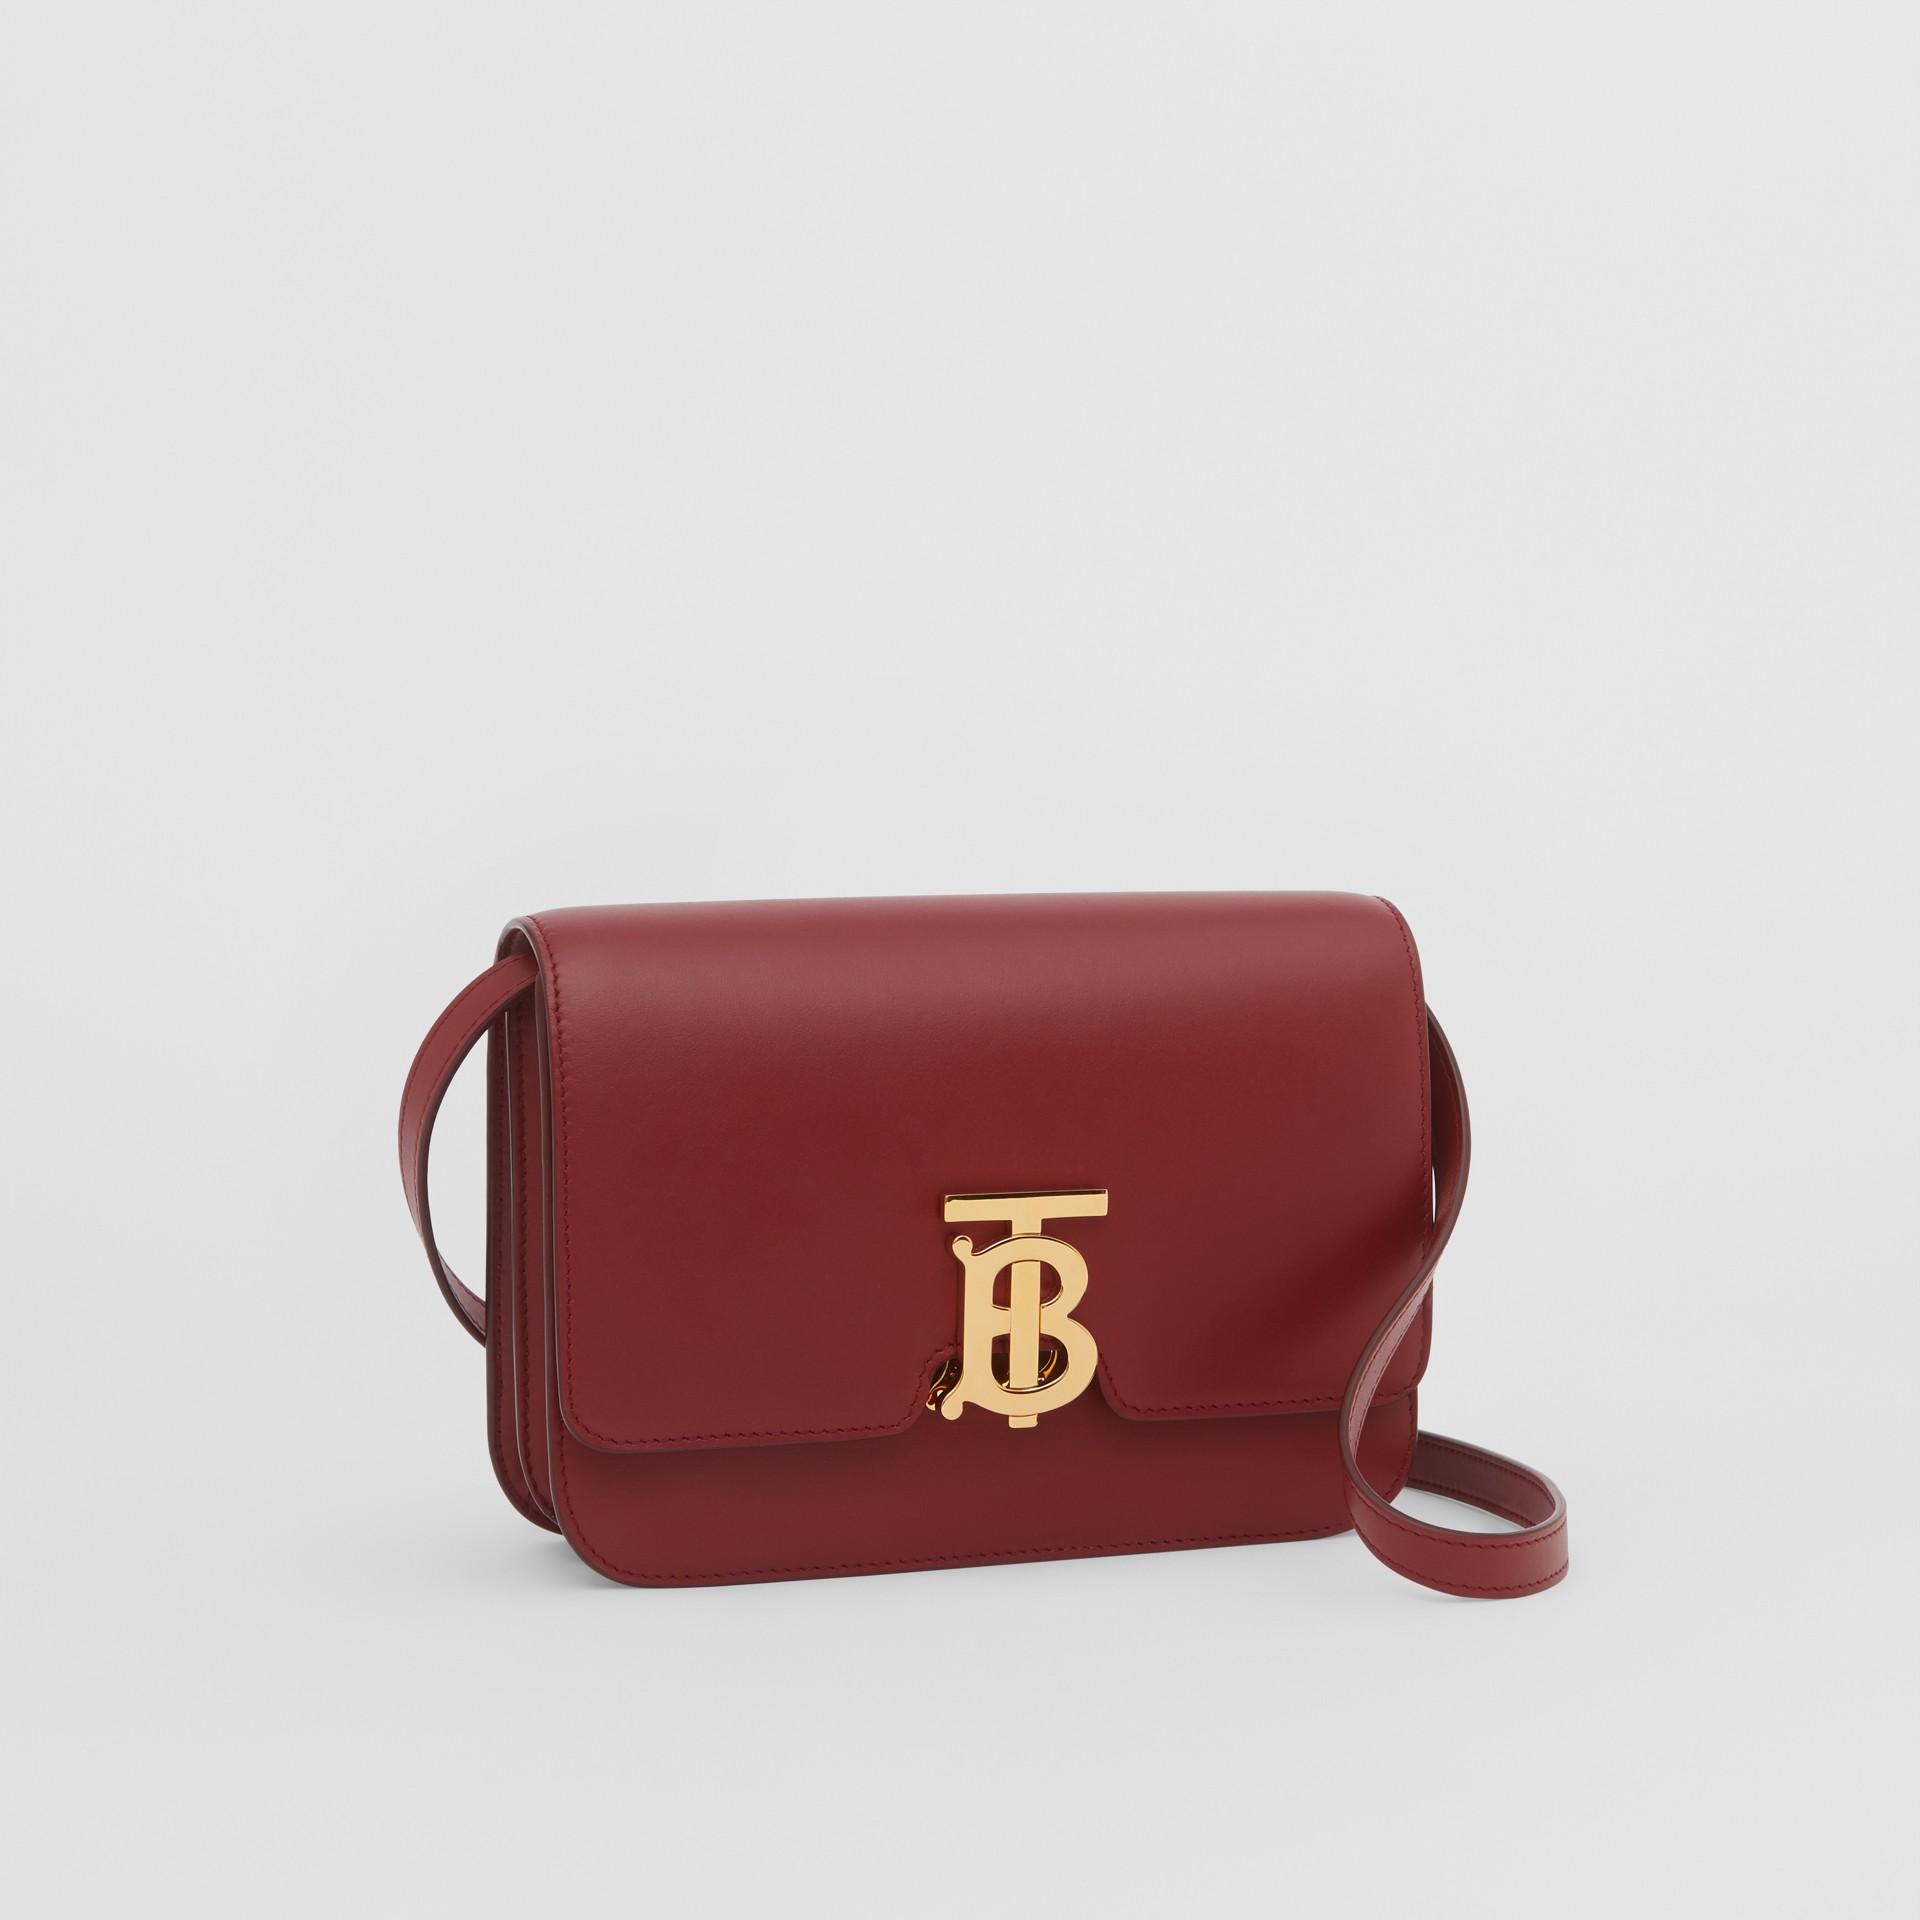 Small Leather TB Bag in Dark Crimson - Women   Burberry - gallery image 6